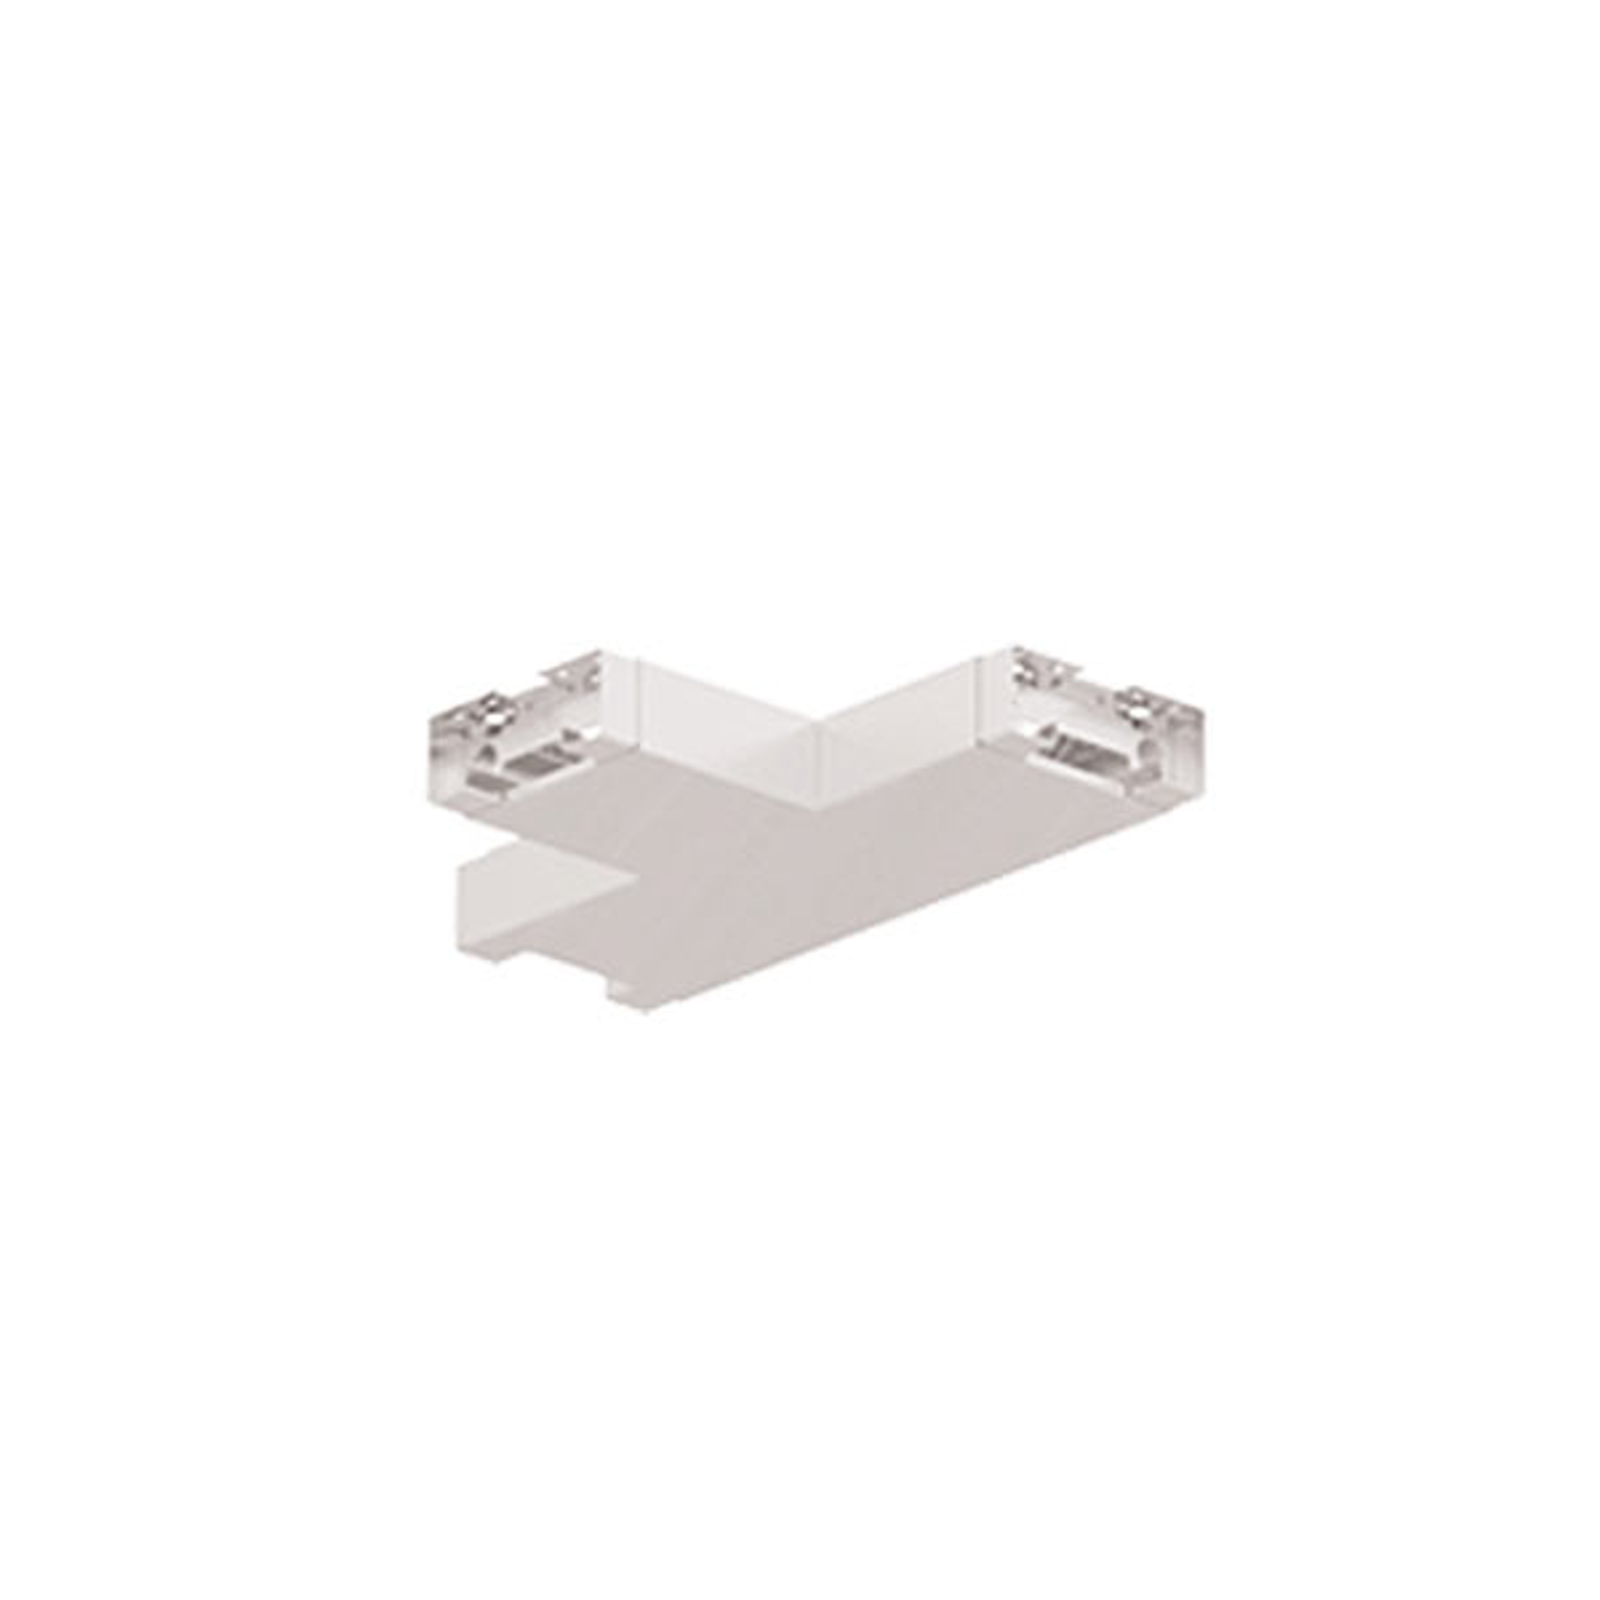 Verbinder Procube-CUVT-1 T90° f. DL Procube